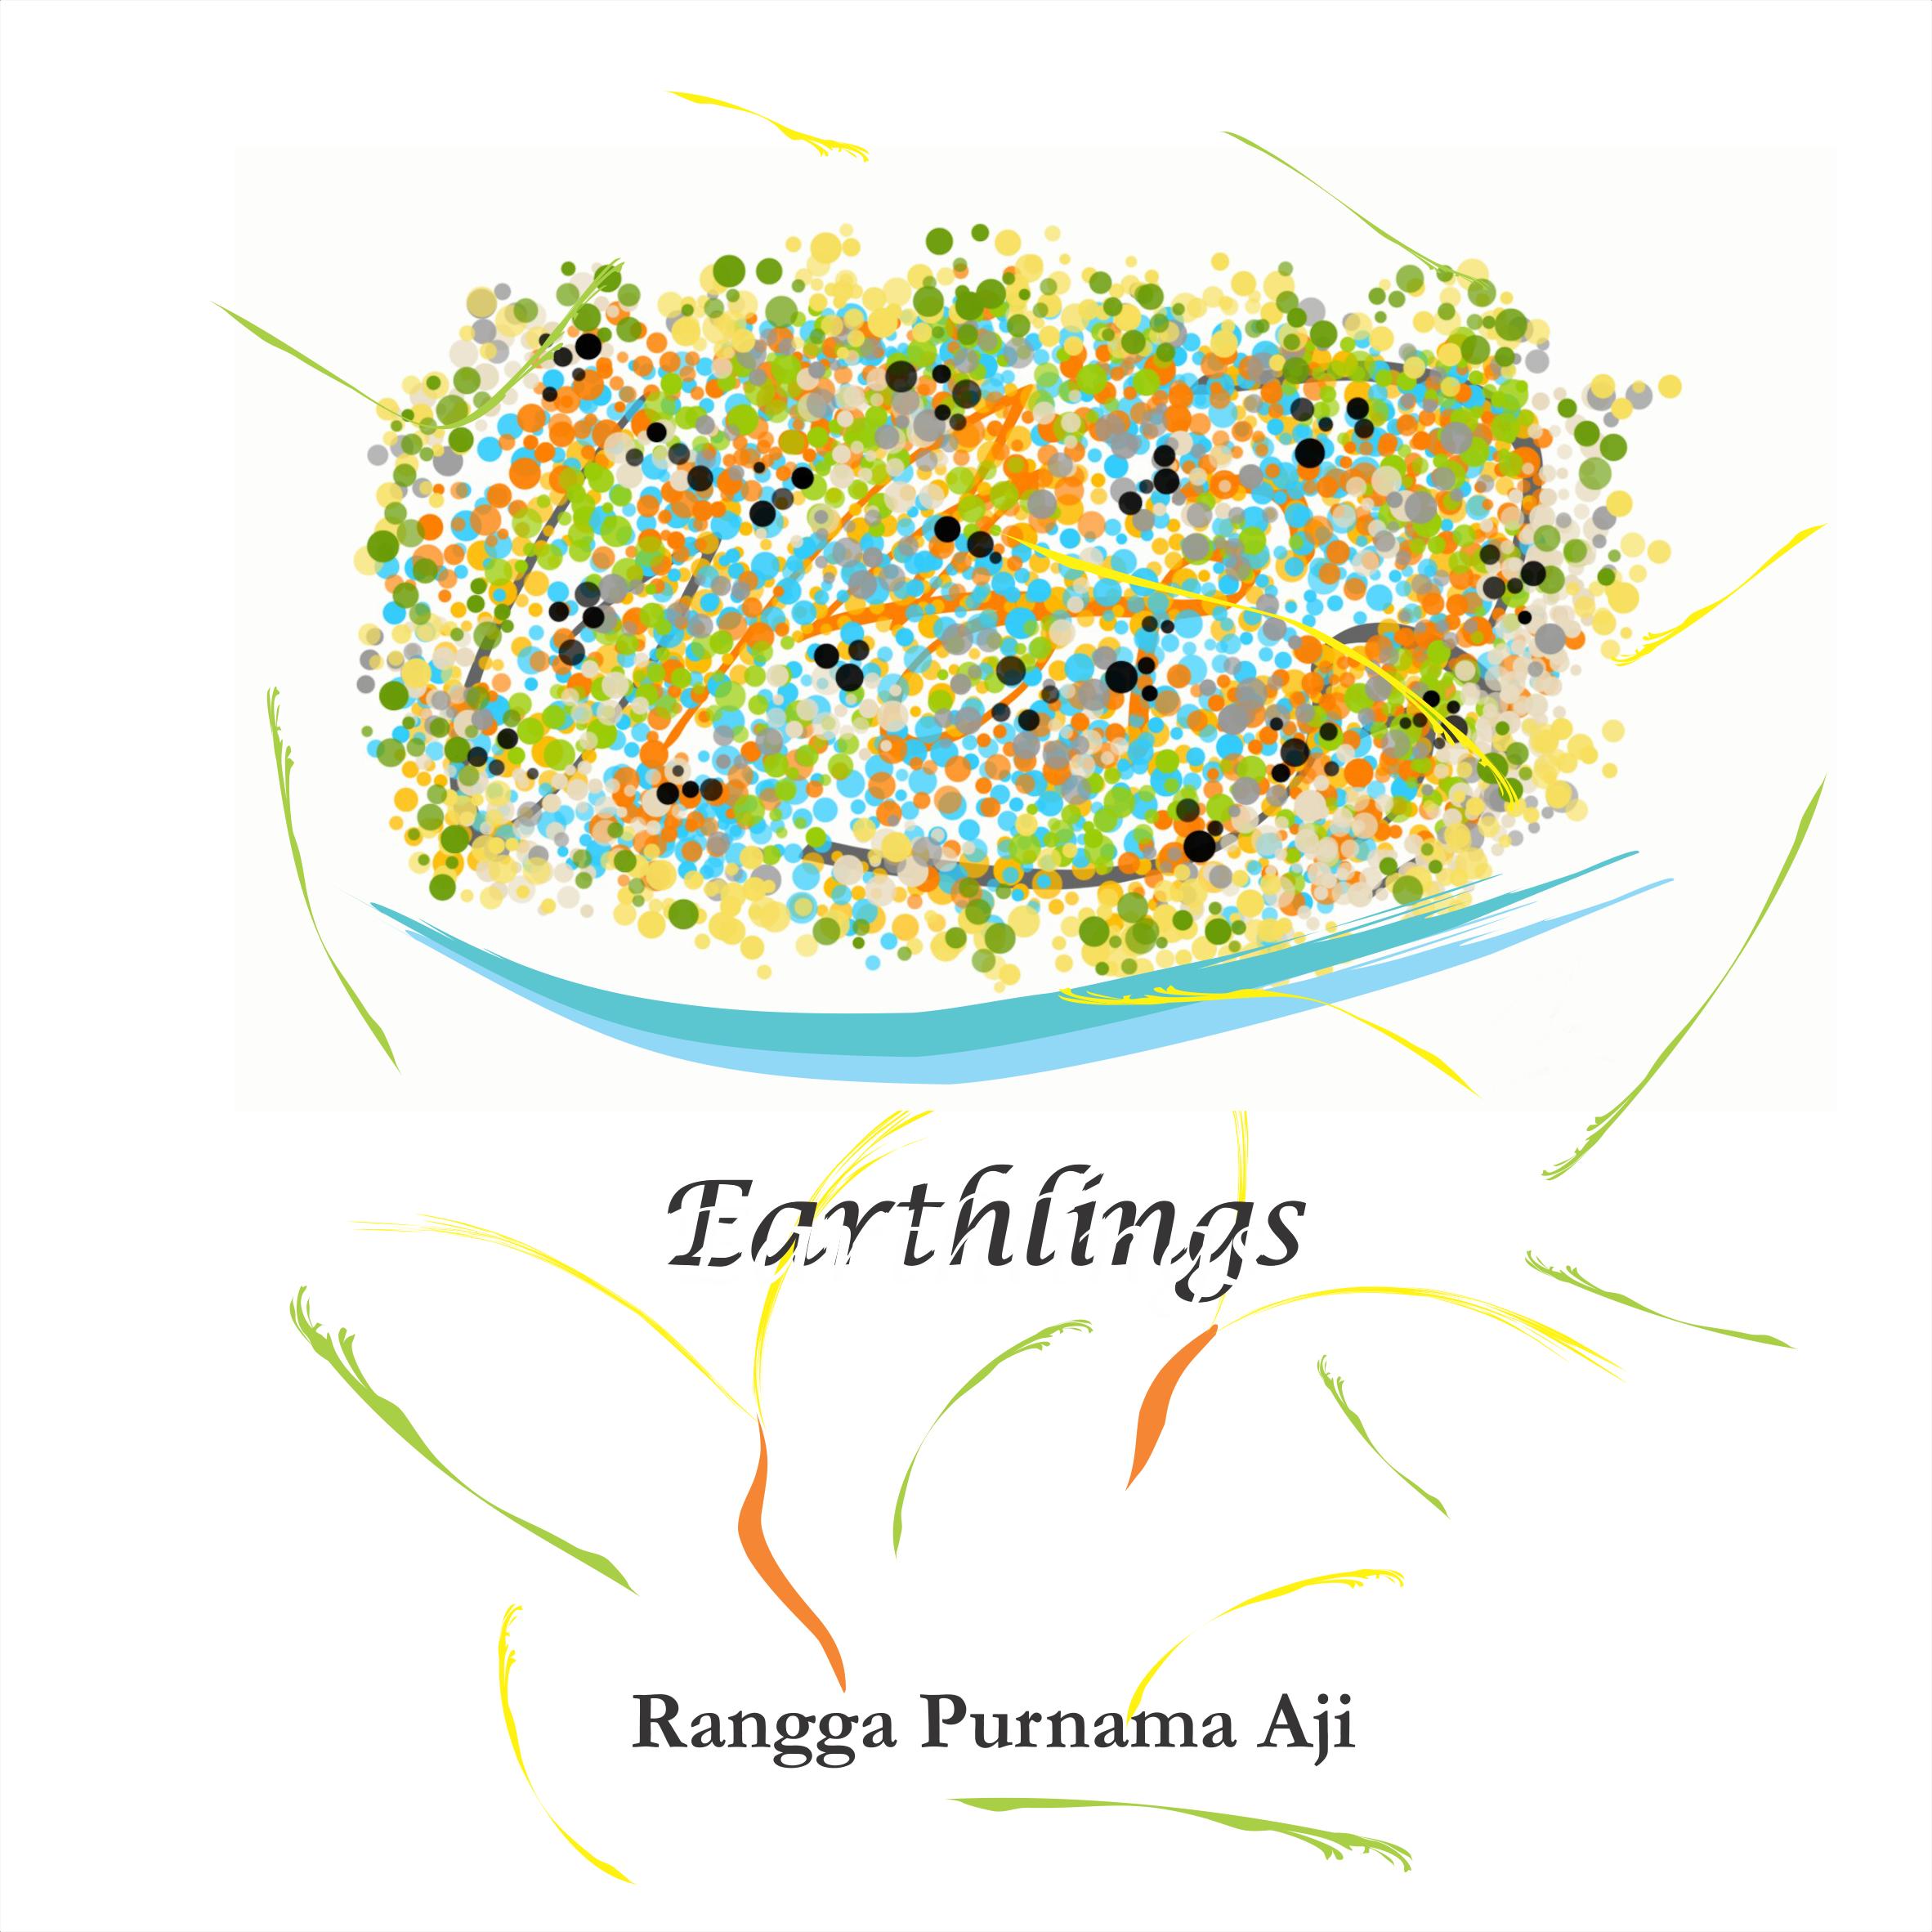 Rangga Purnama Aji – Earthlings